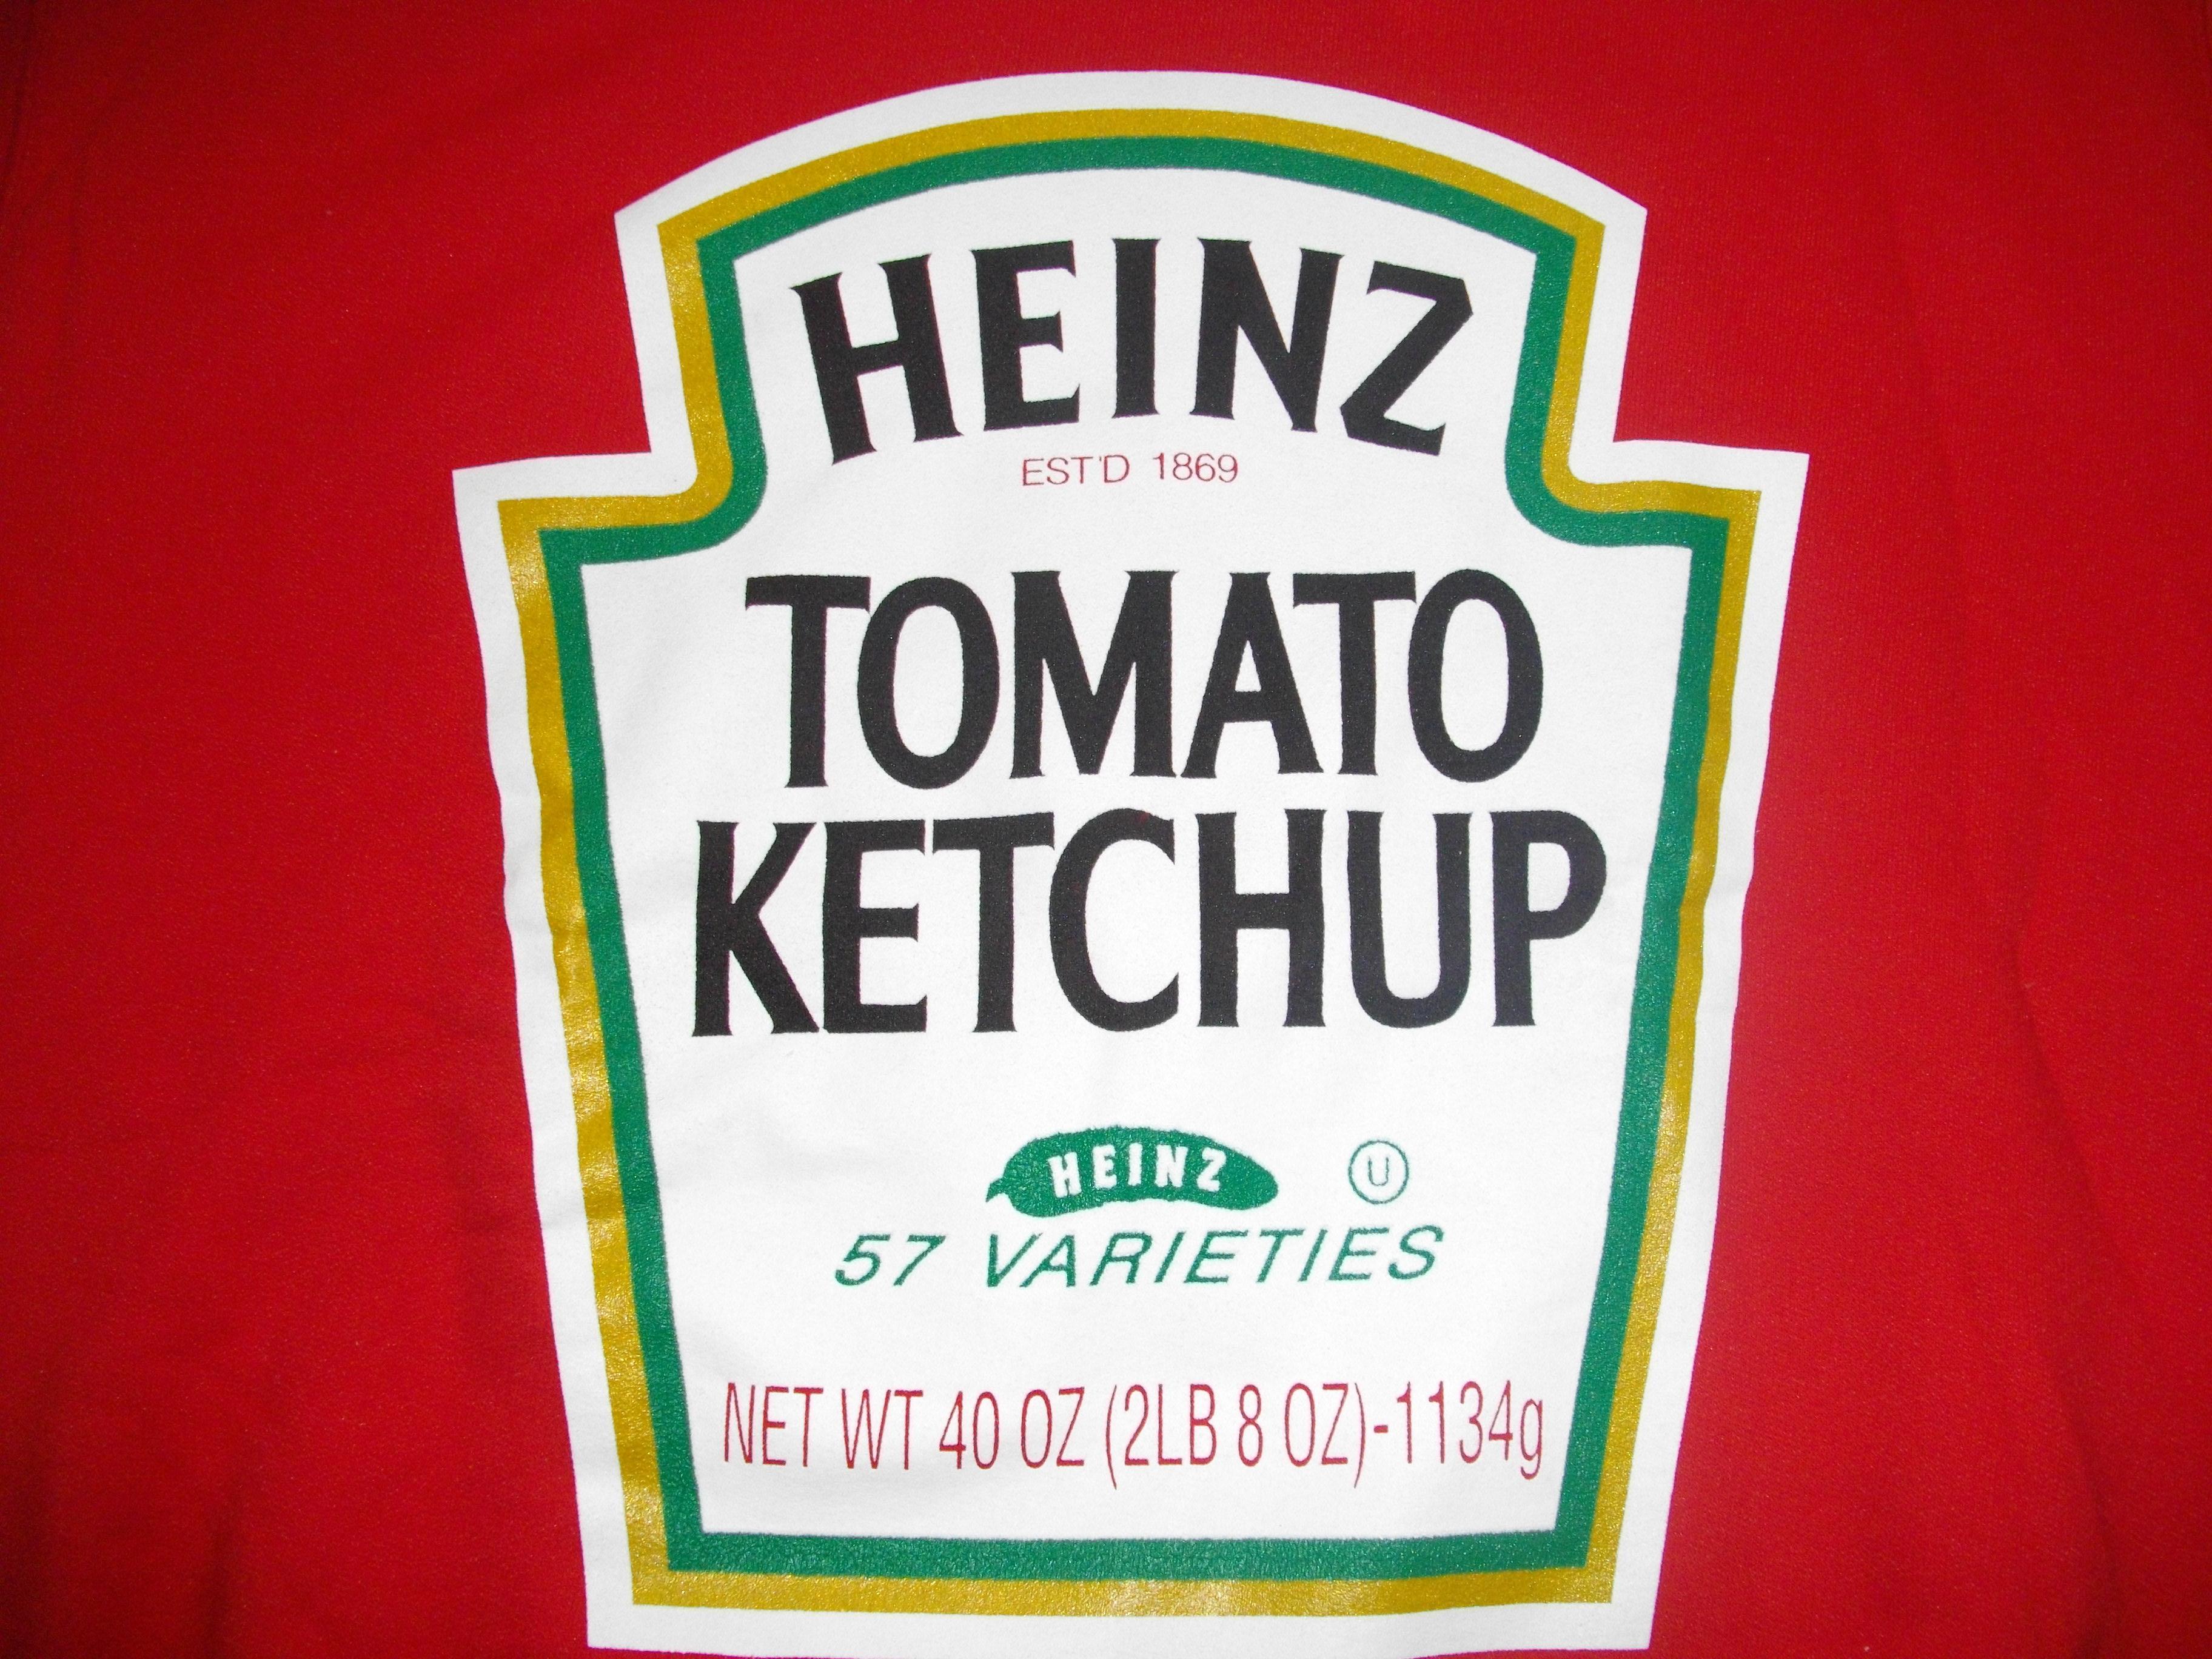 Pin Heinz-57-logo on Pinterest